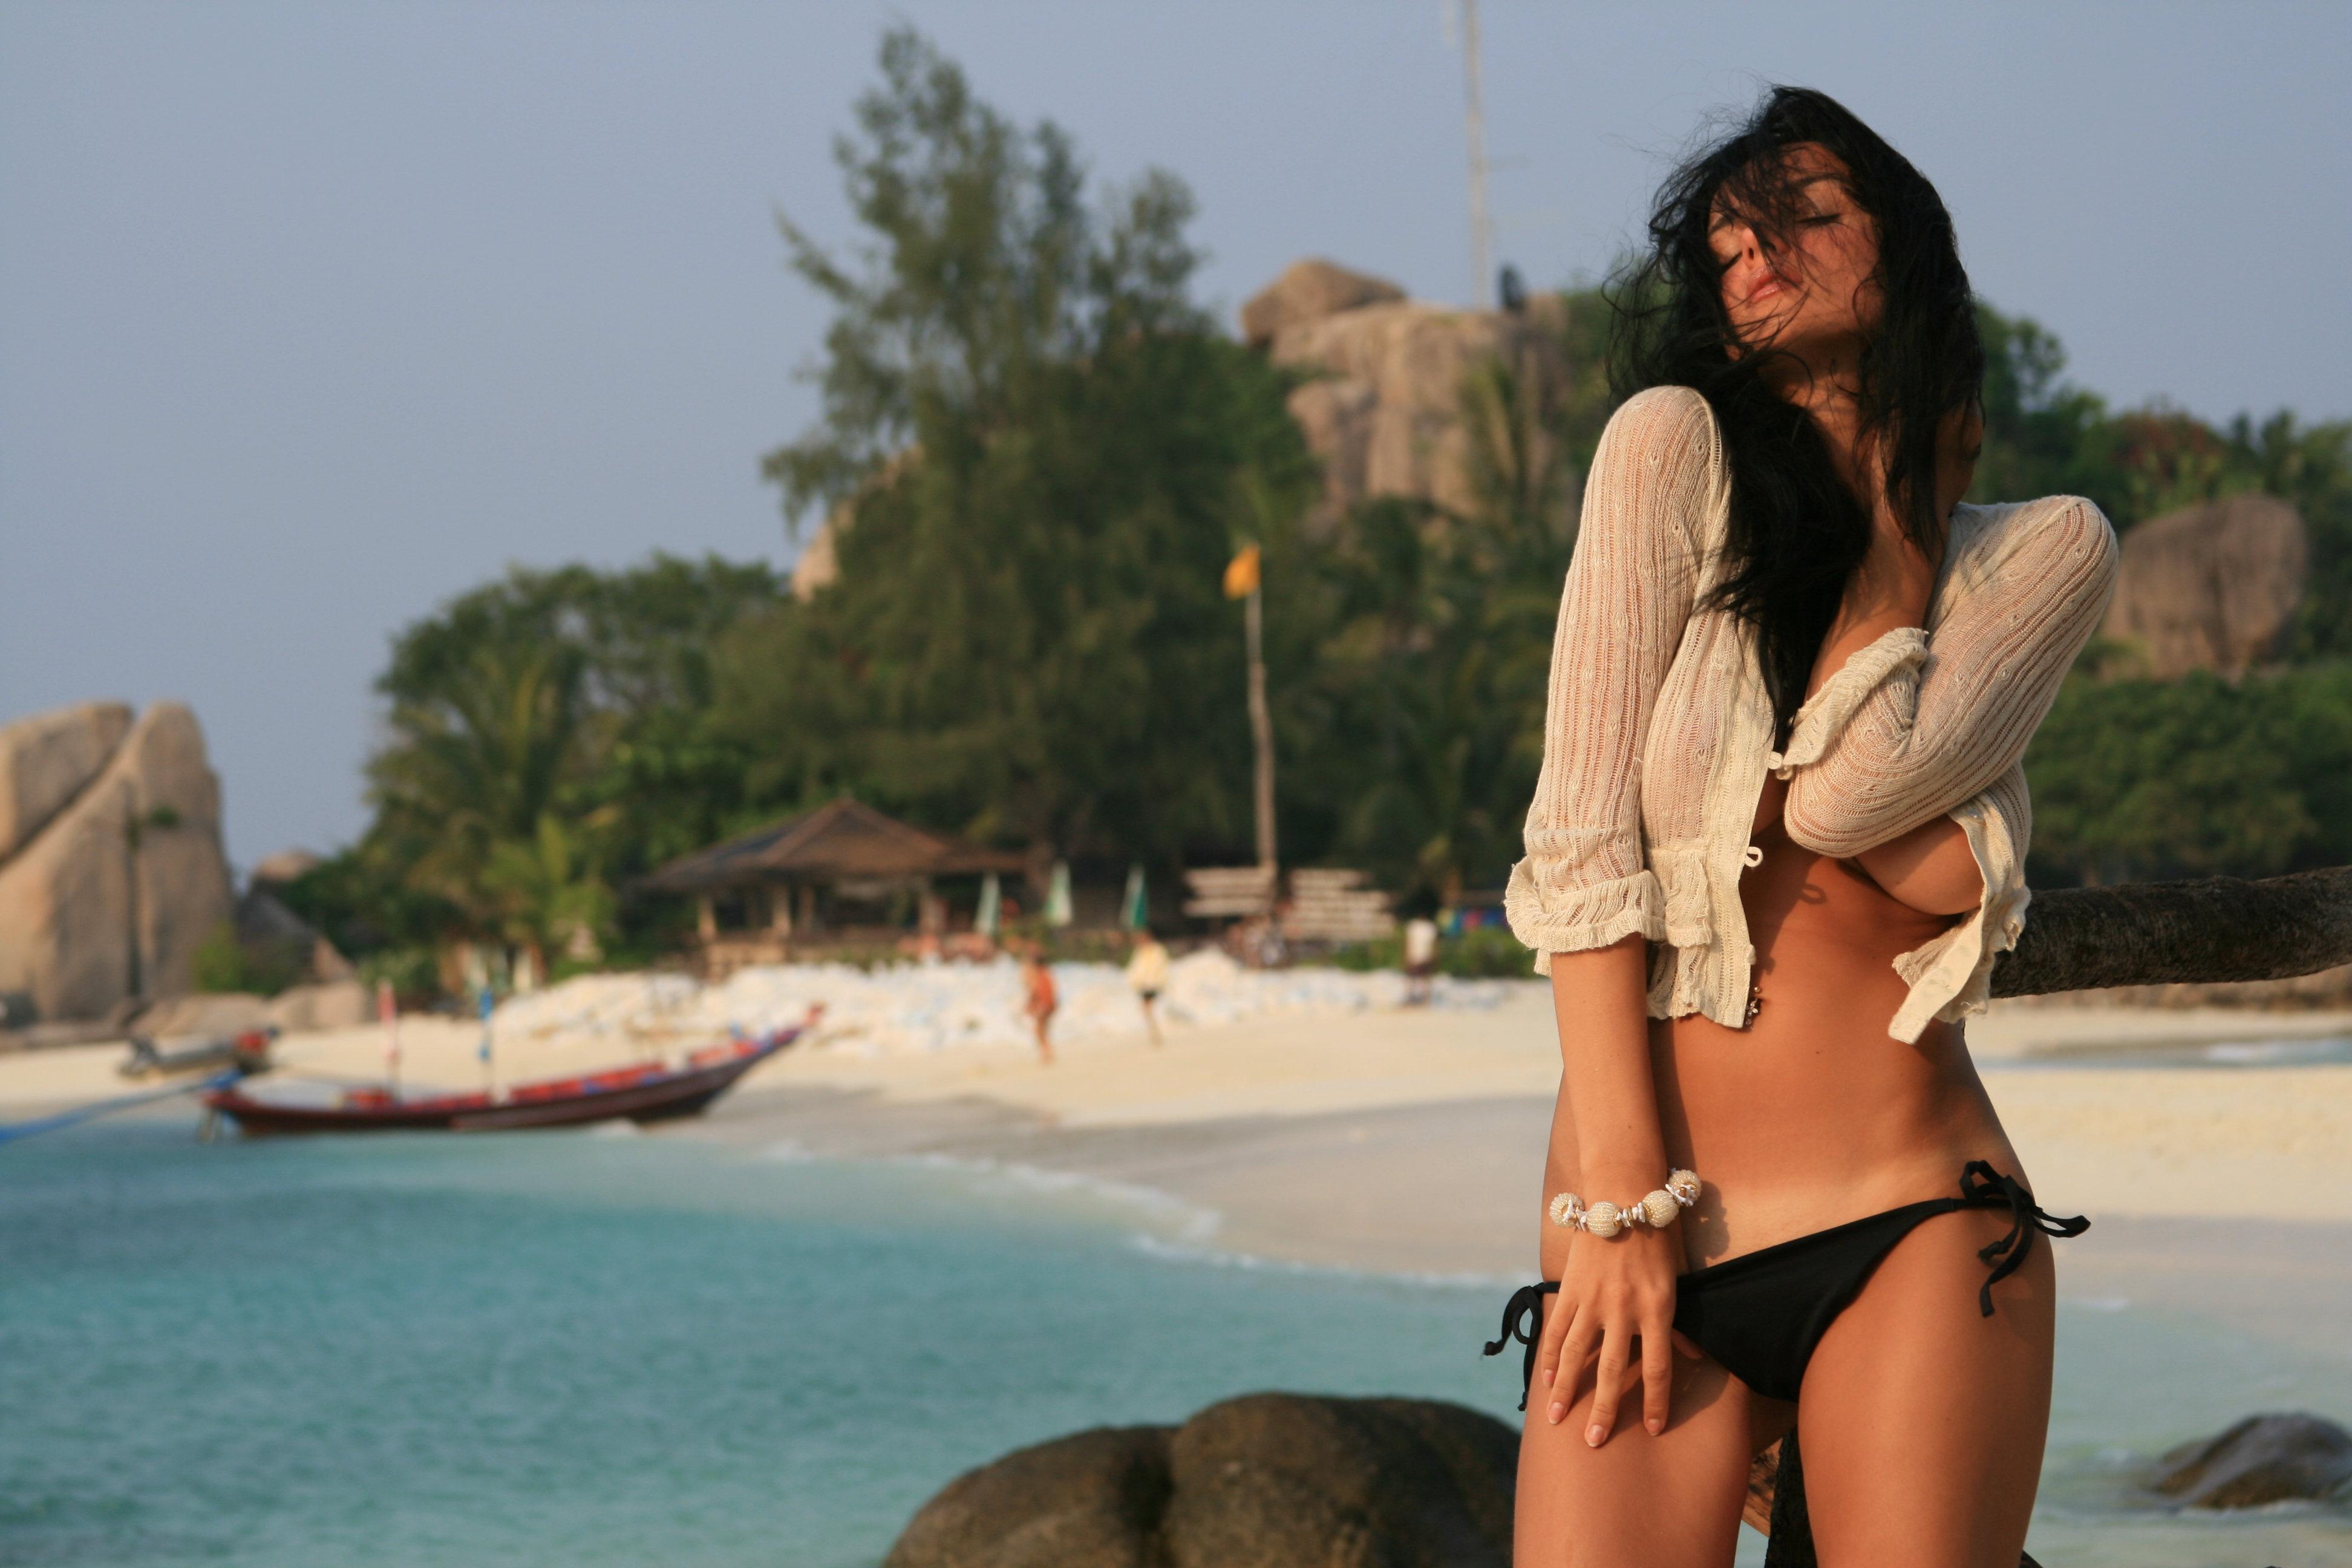 Красивая брюнетка на пляже фото